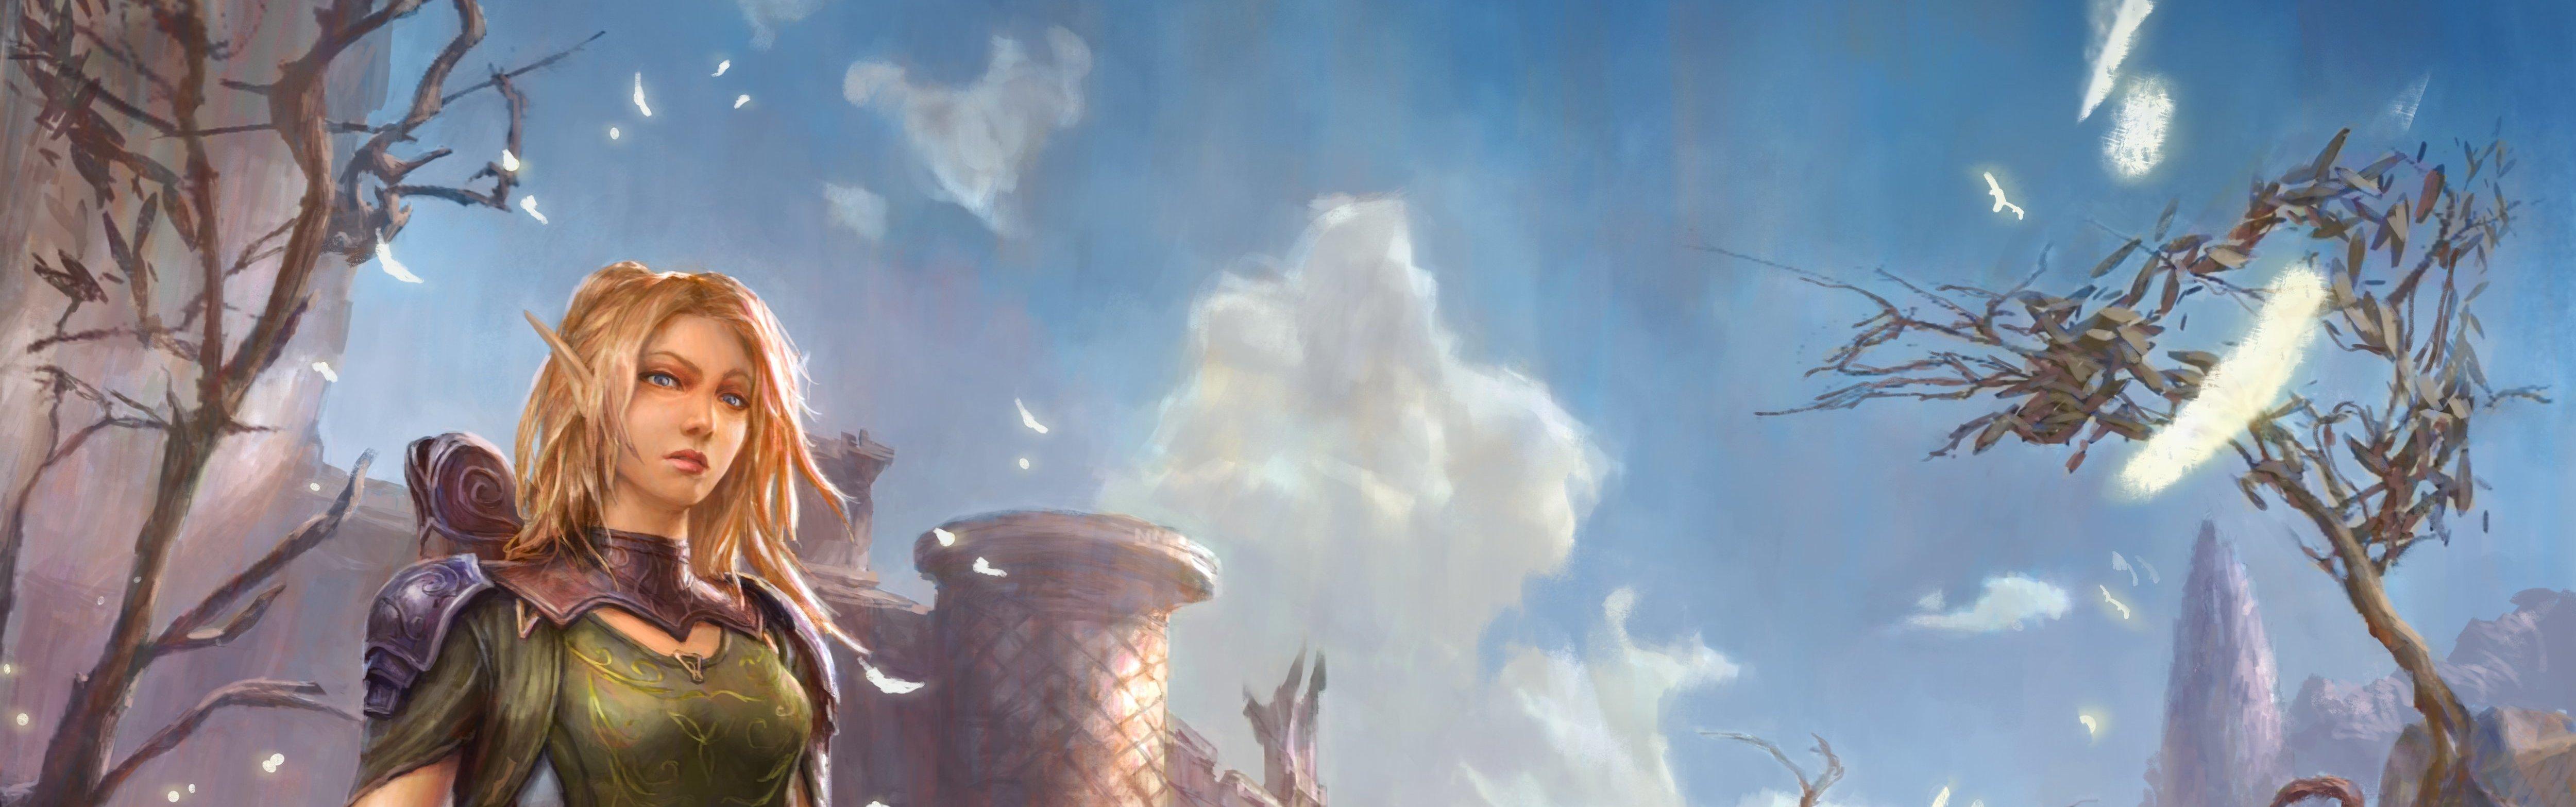 Eternity: The Last Unicorn Steam Key GLOBAL